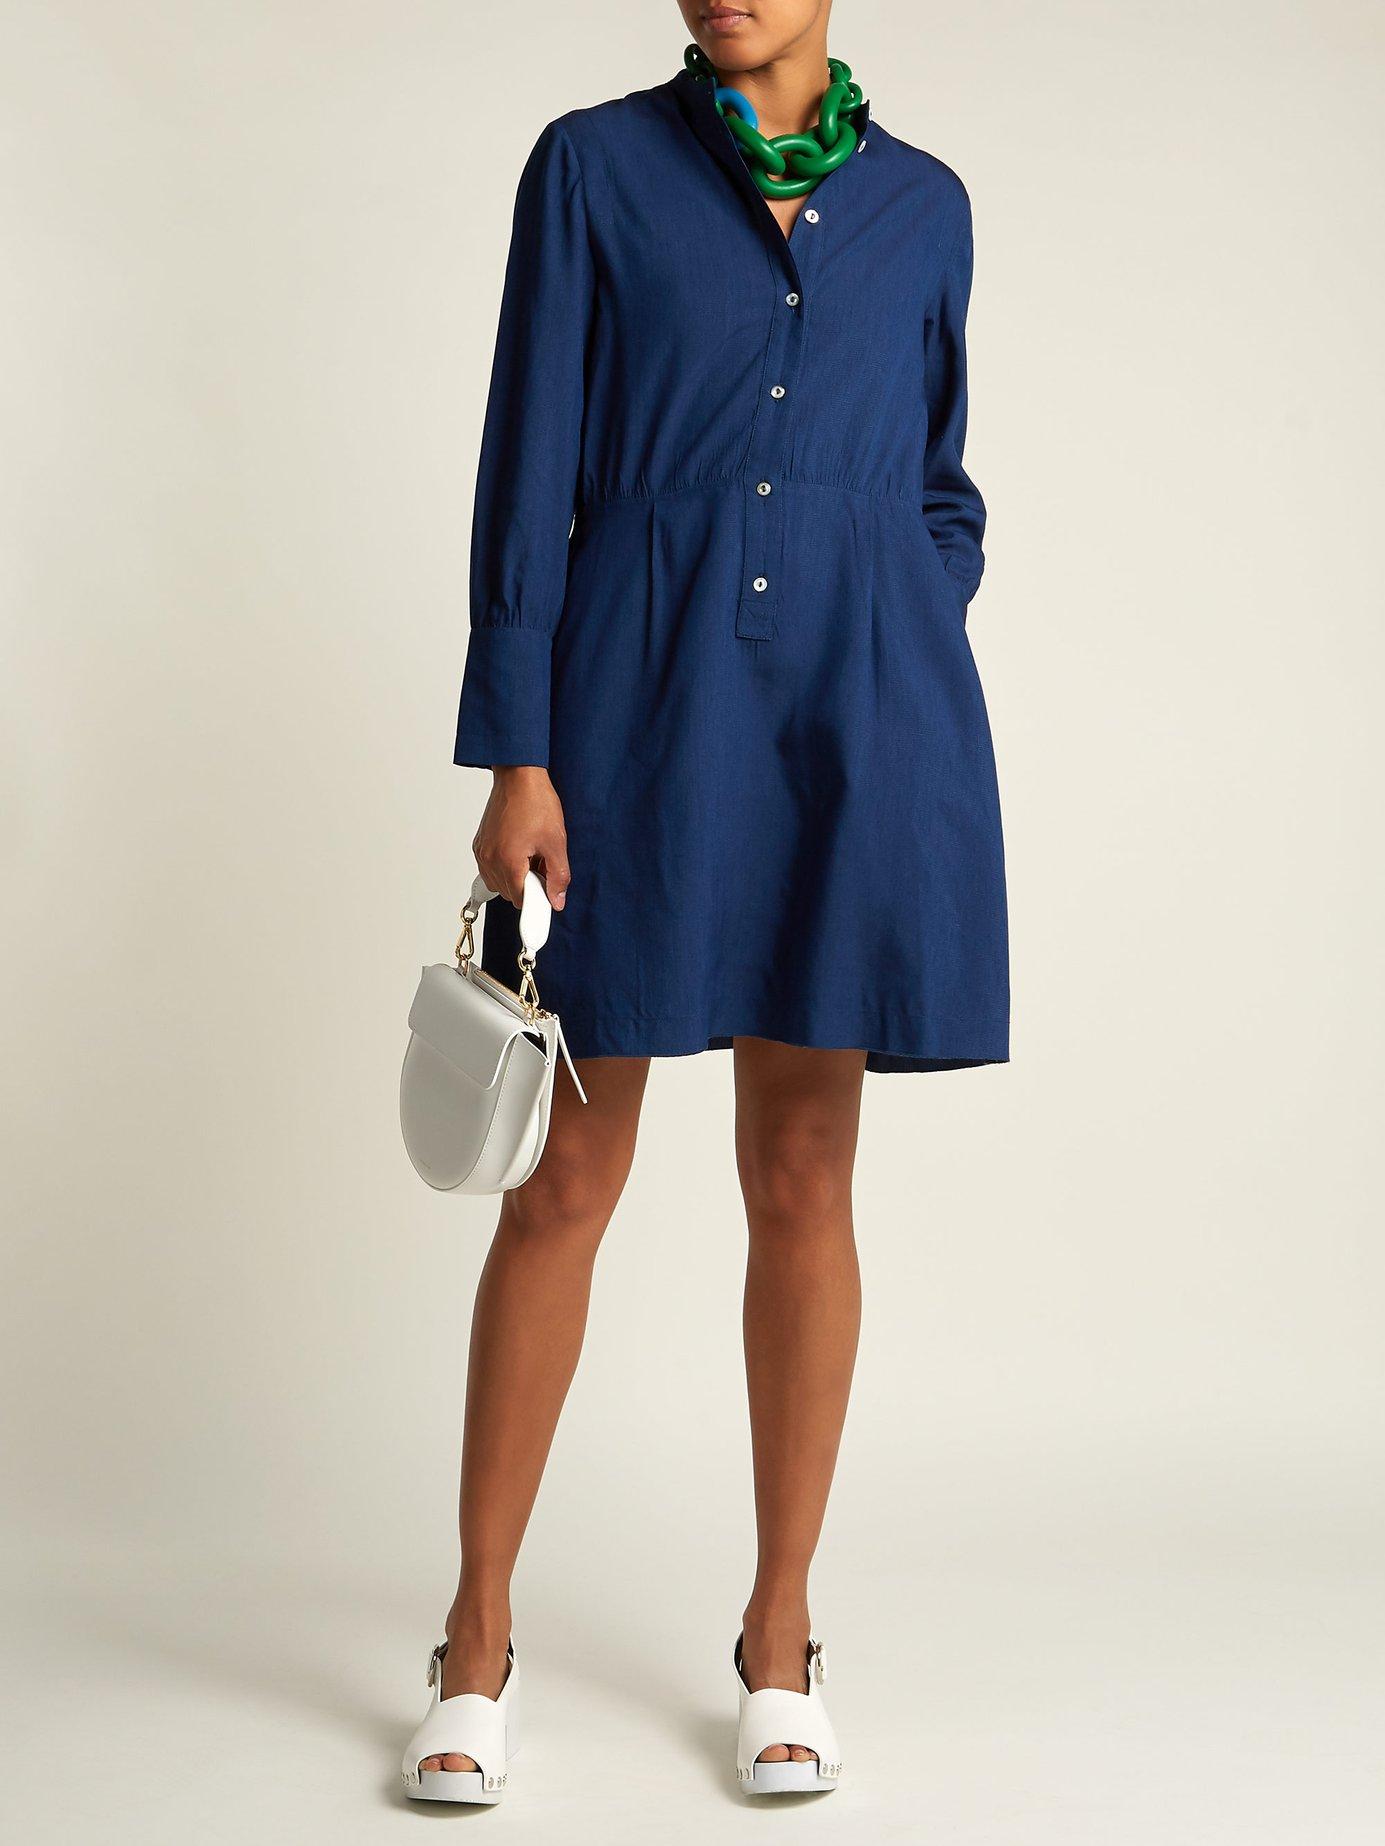 Kimya long-sleeve midi dress by A.P.C.